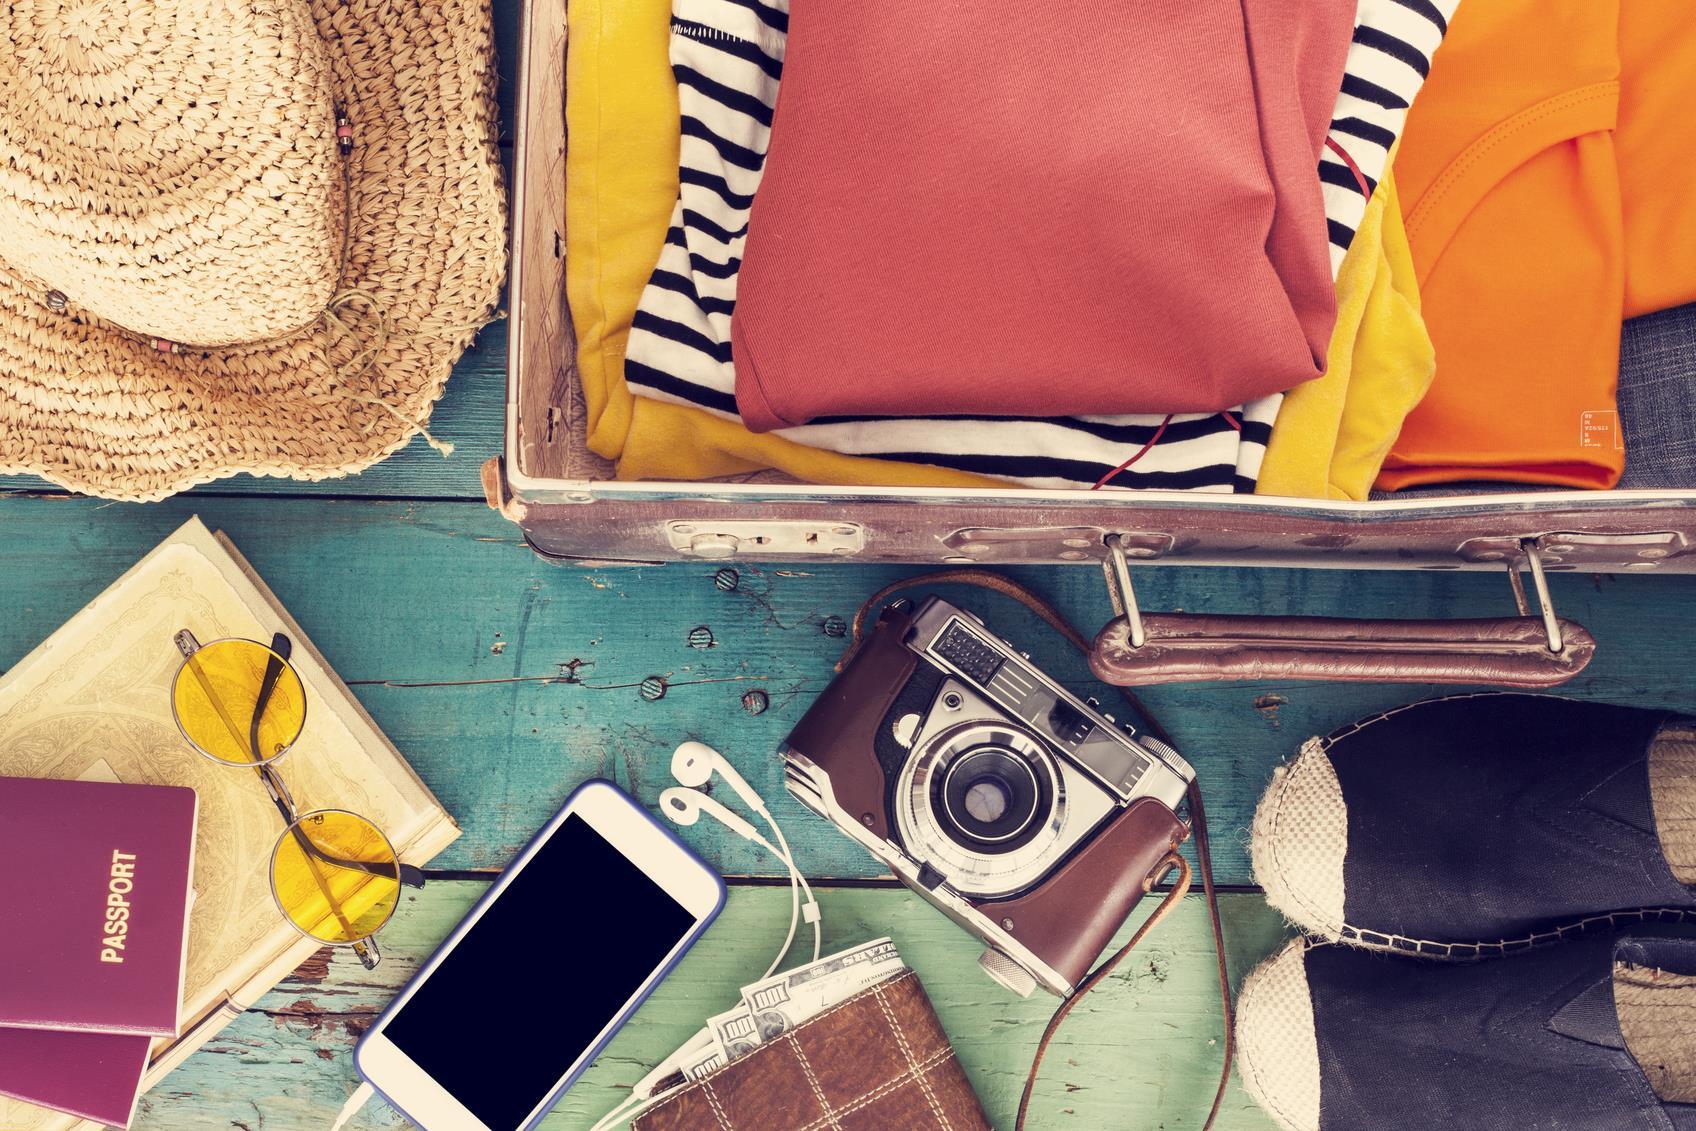 10 Dinge, die man immer zuhause vergisst - DSI Reisen